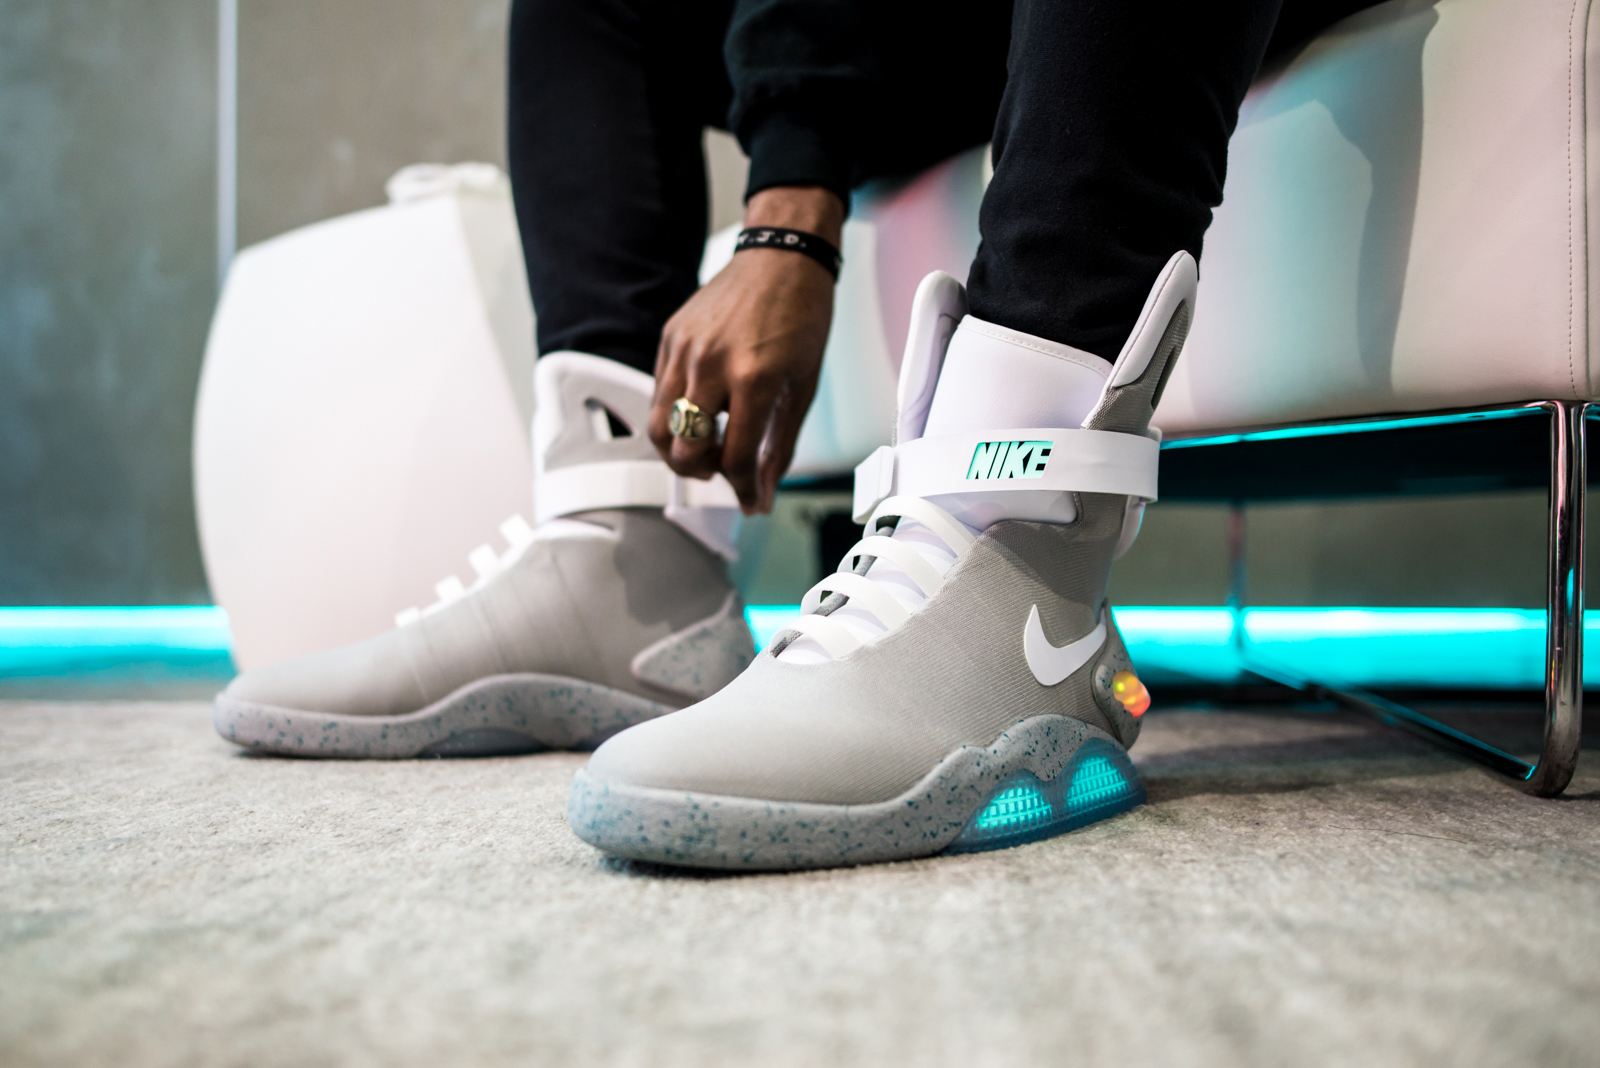 Sepatu Nike MAG Back to the Future Laku